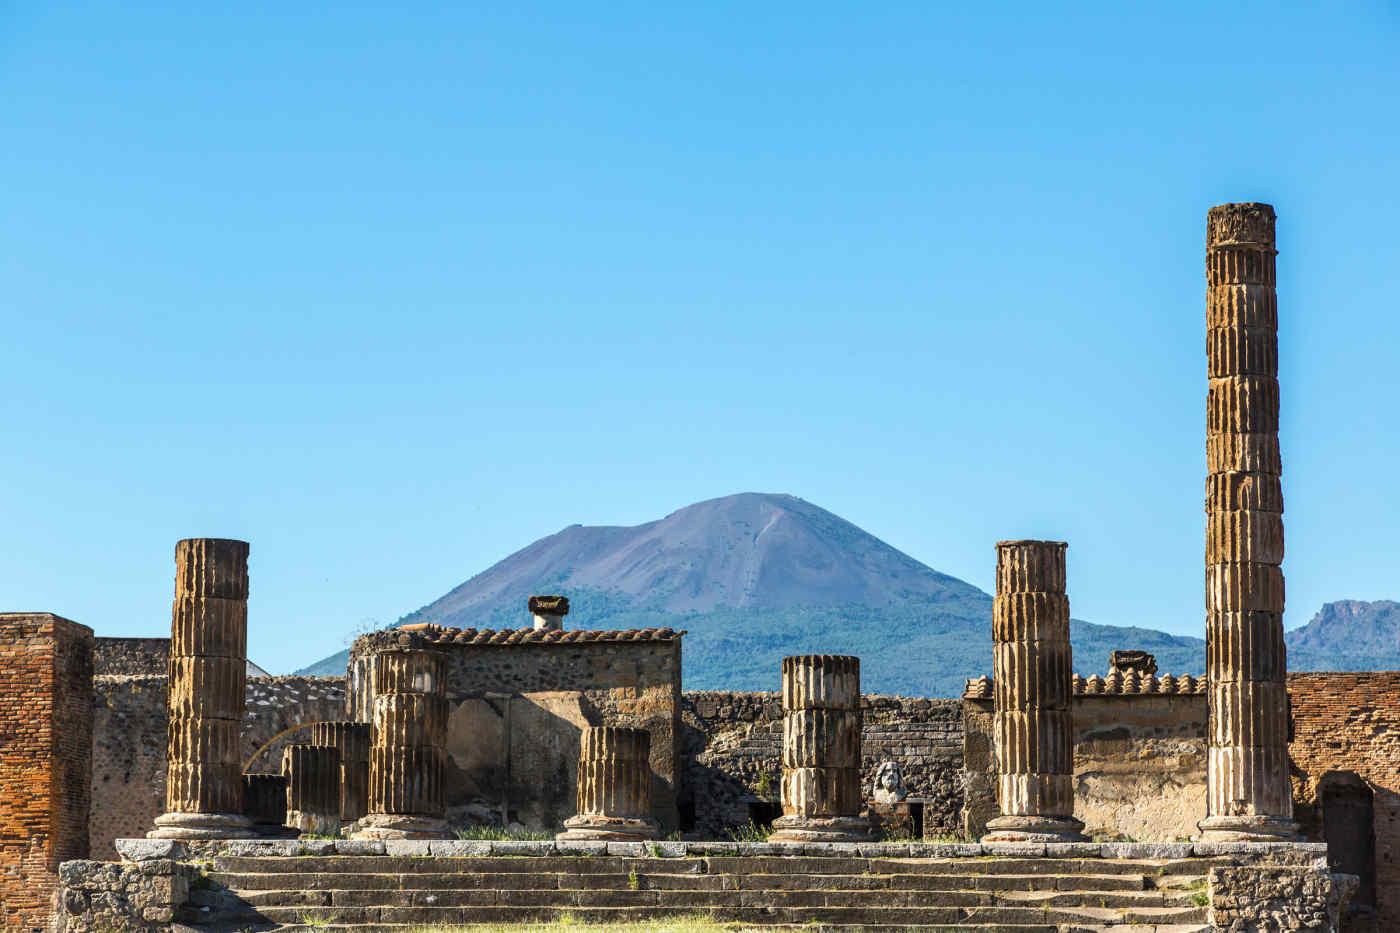 Mount Vesuvius and Pompeii in Naples, Italy